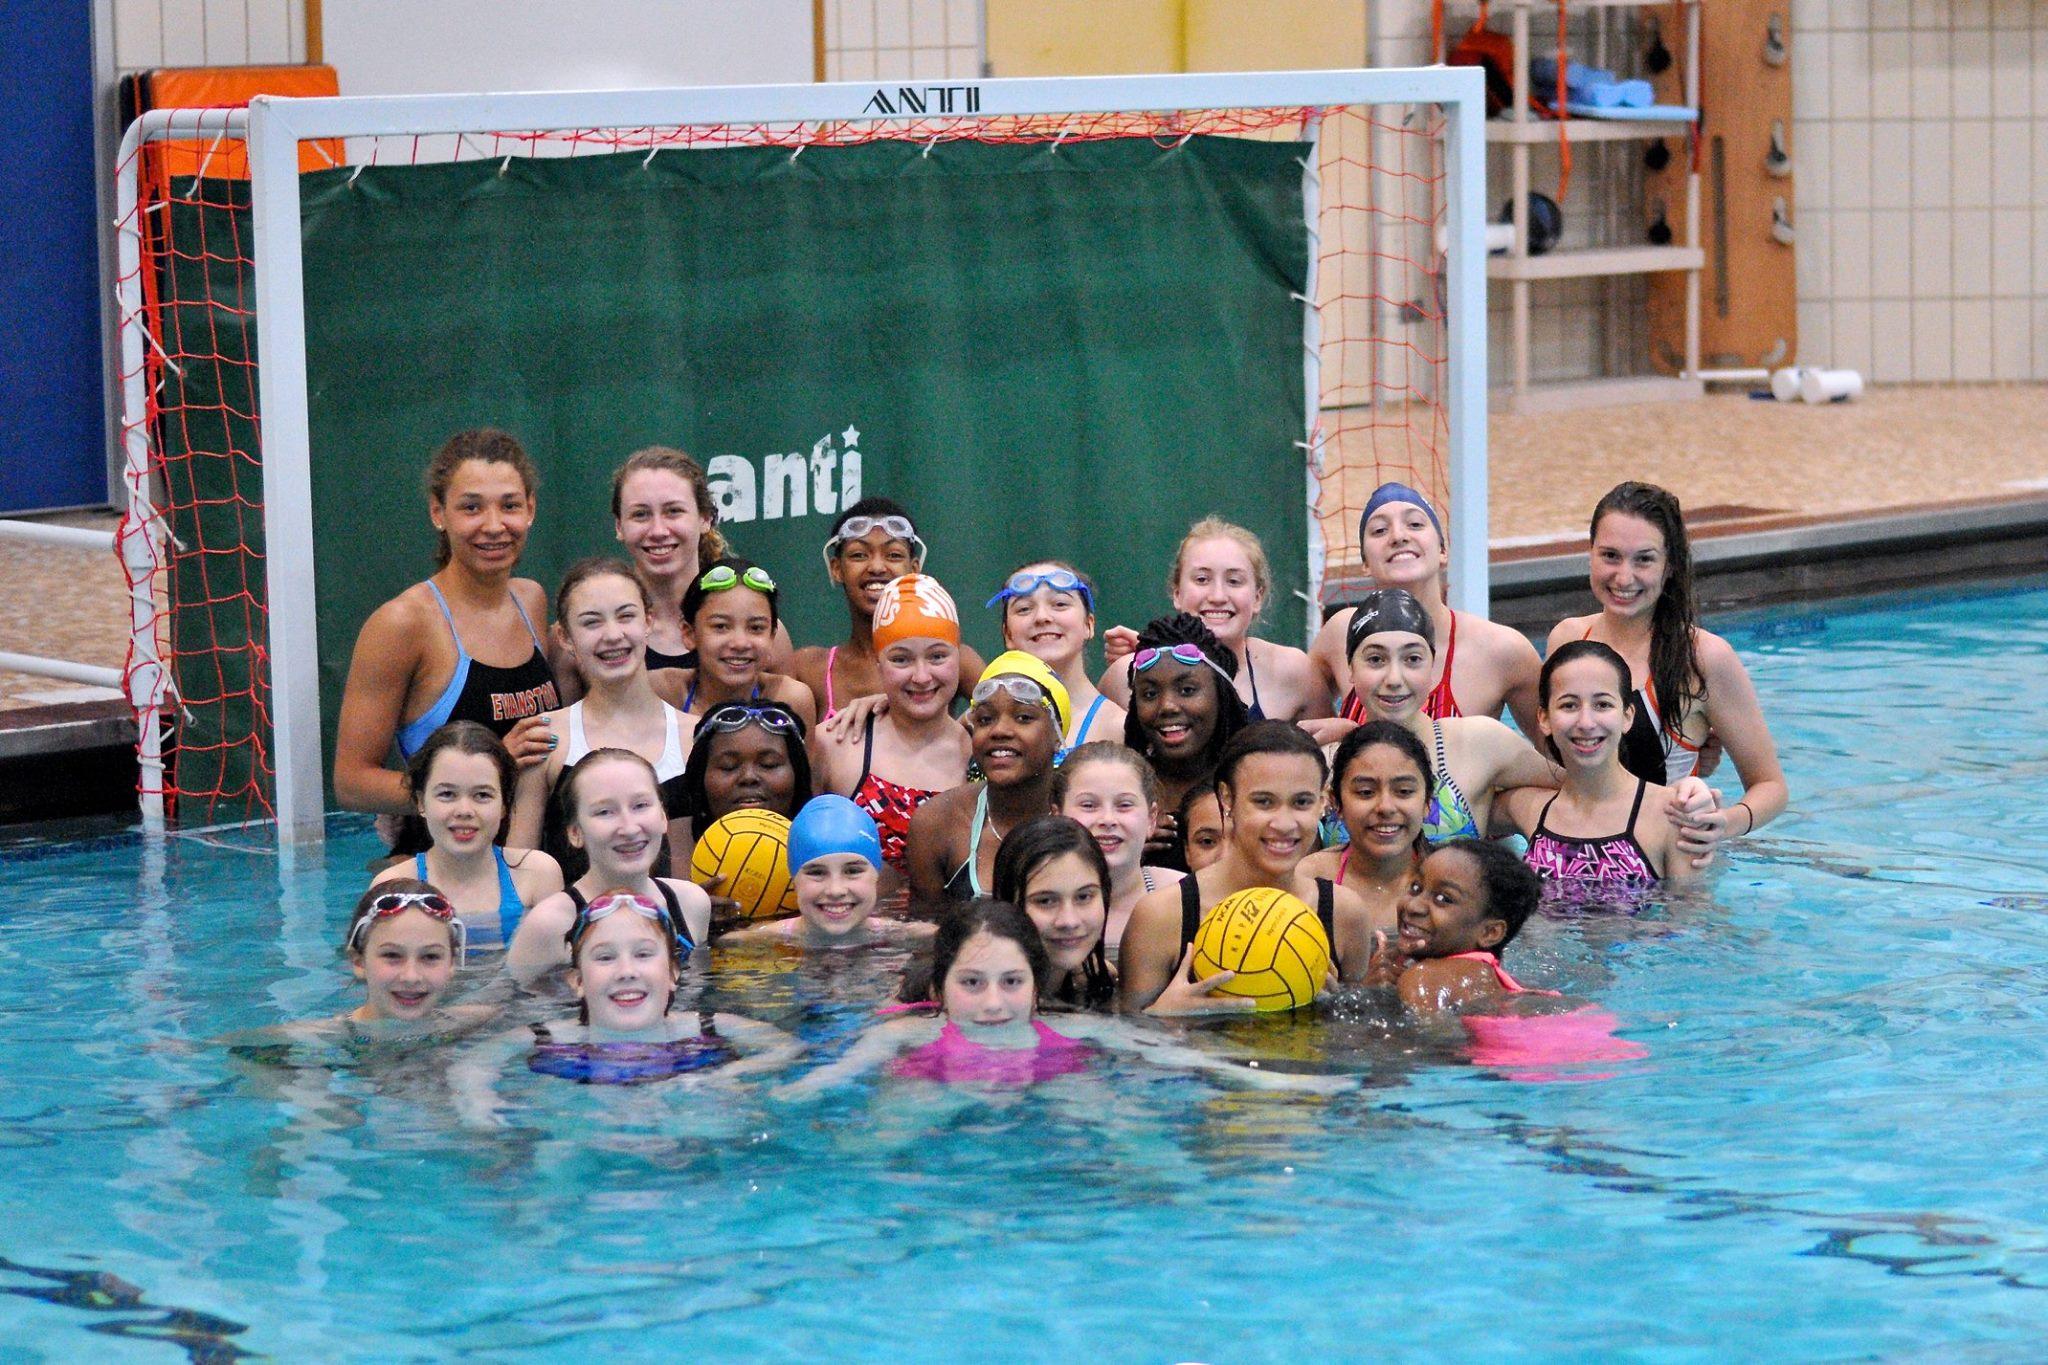 Evanston_GirlsPlaySports